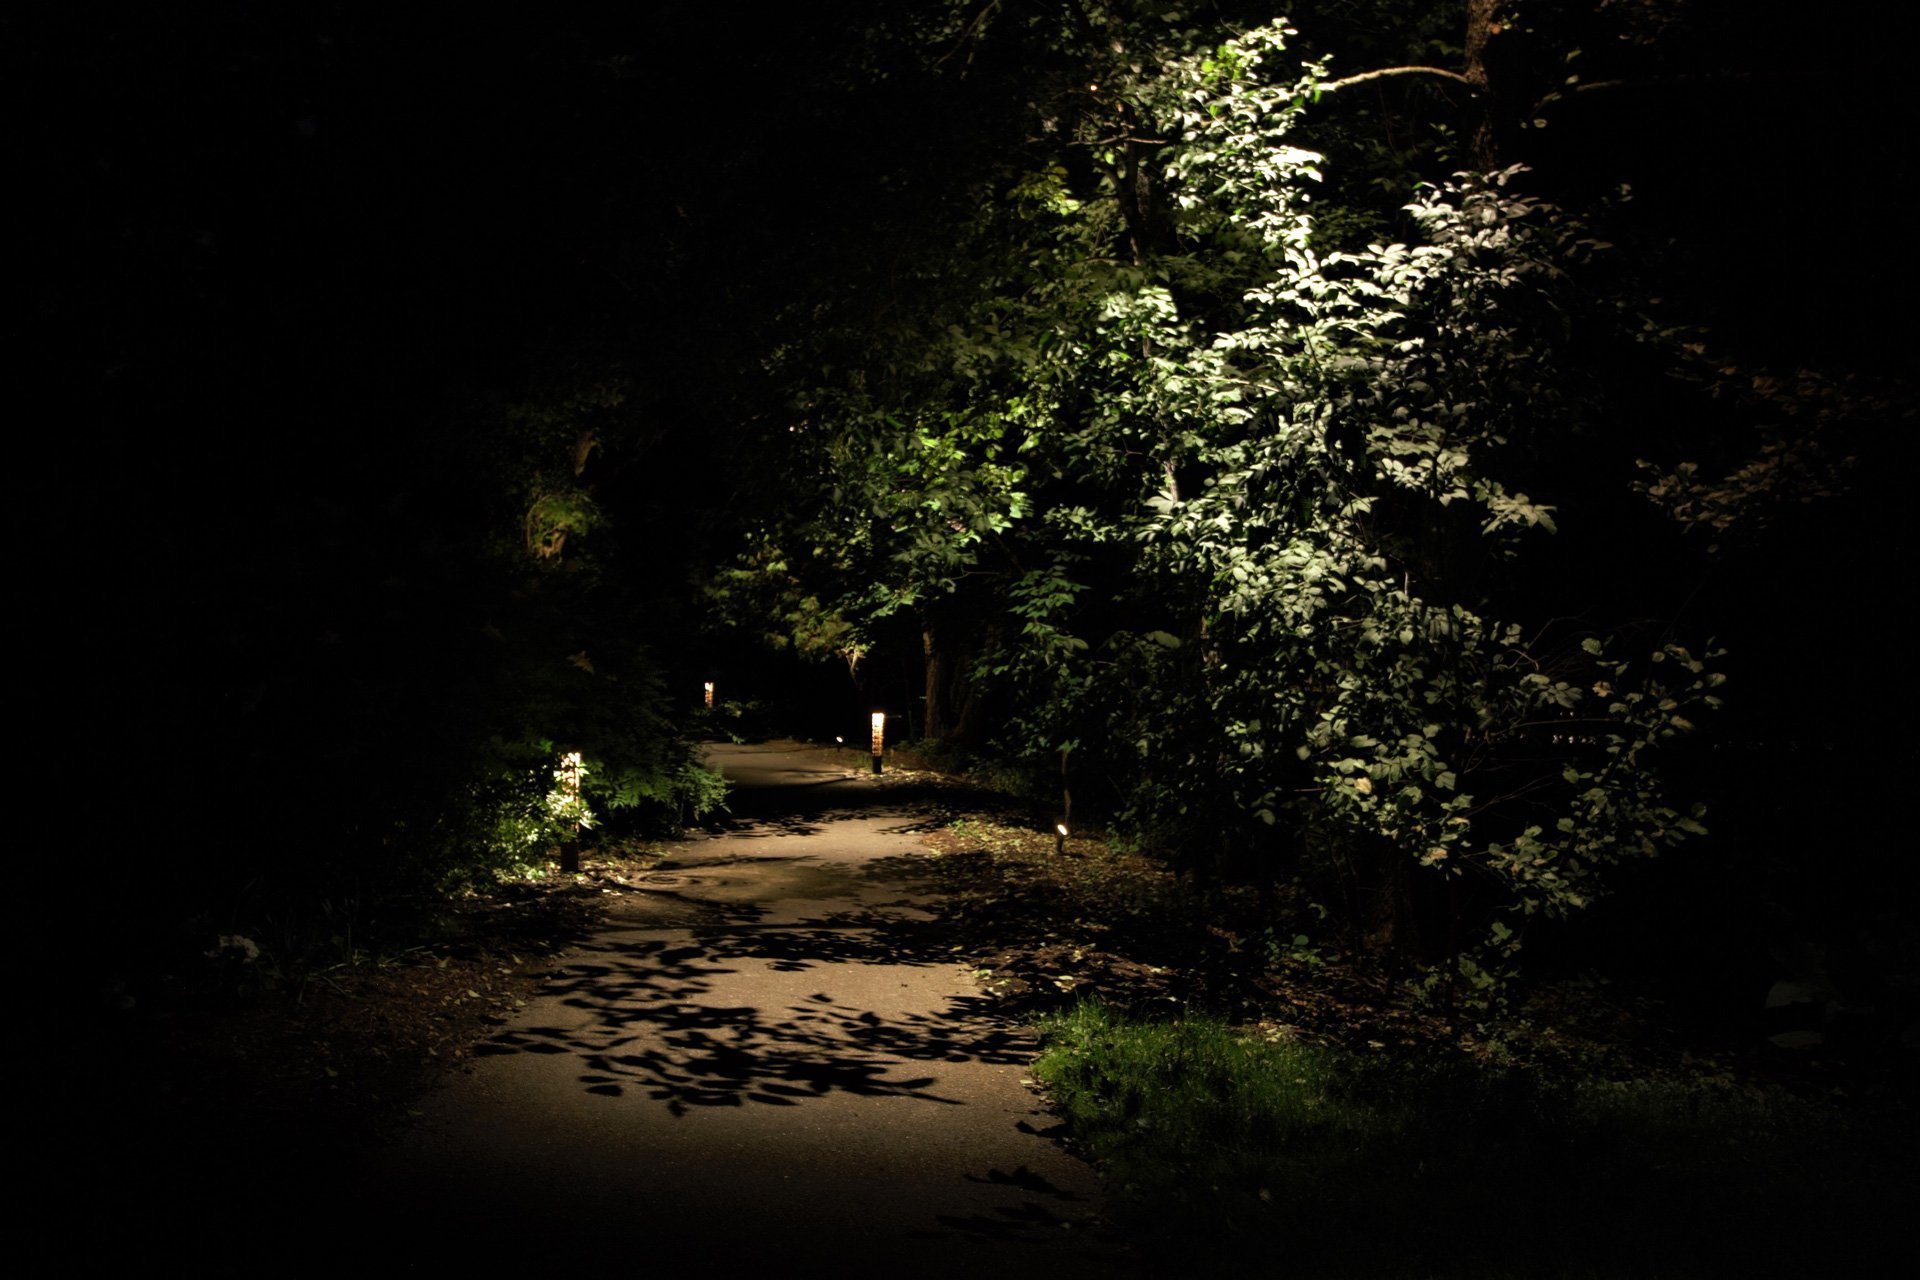 night owl landscape lighting boerner botanical gardens pathlight security foliage shadows